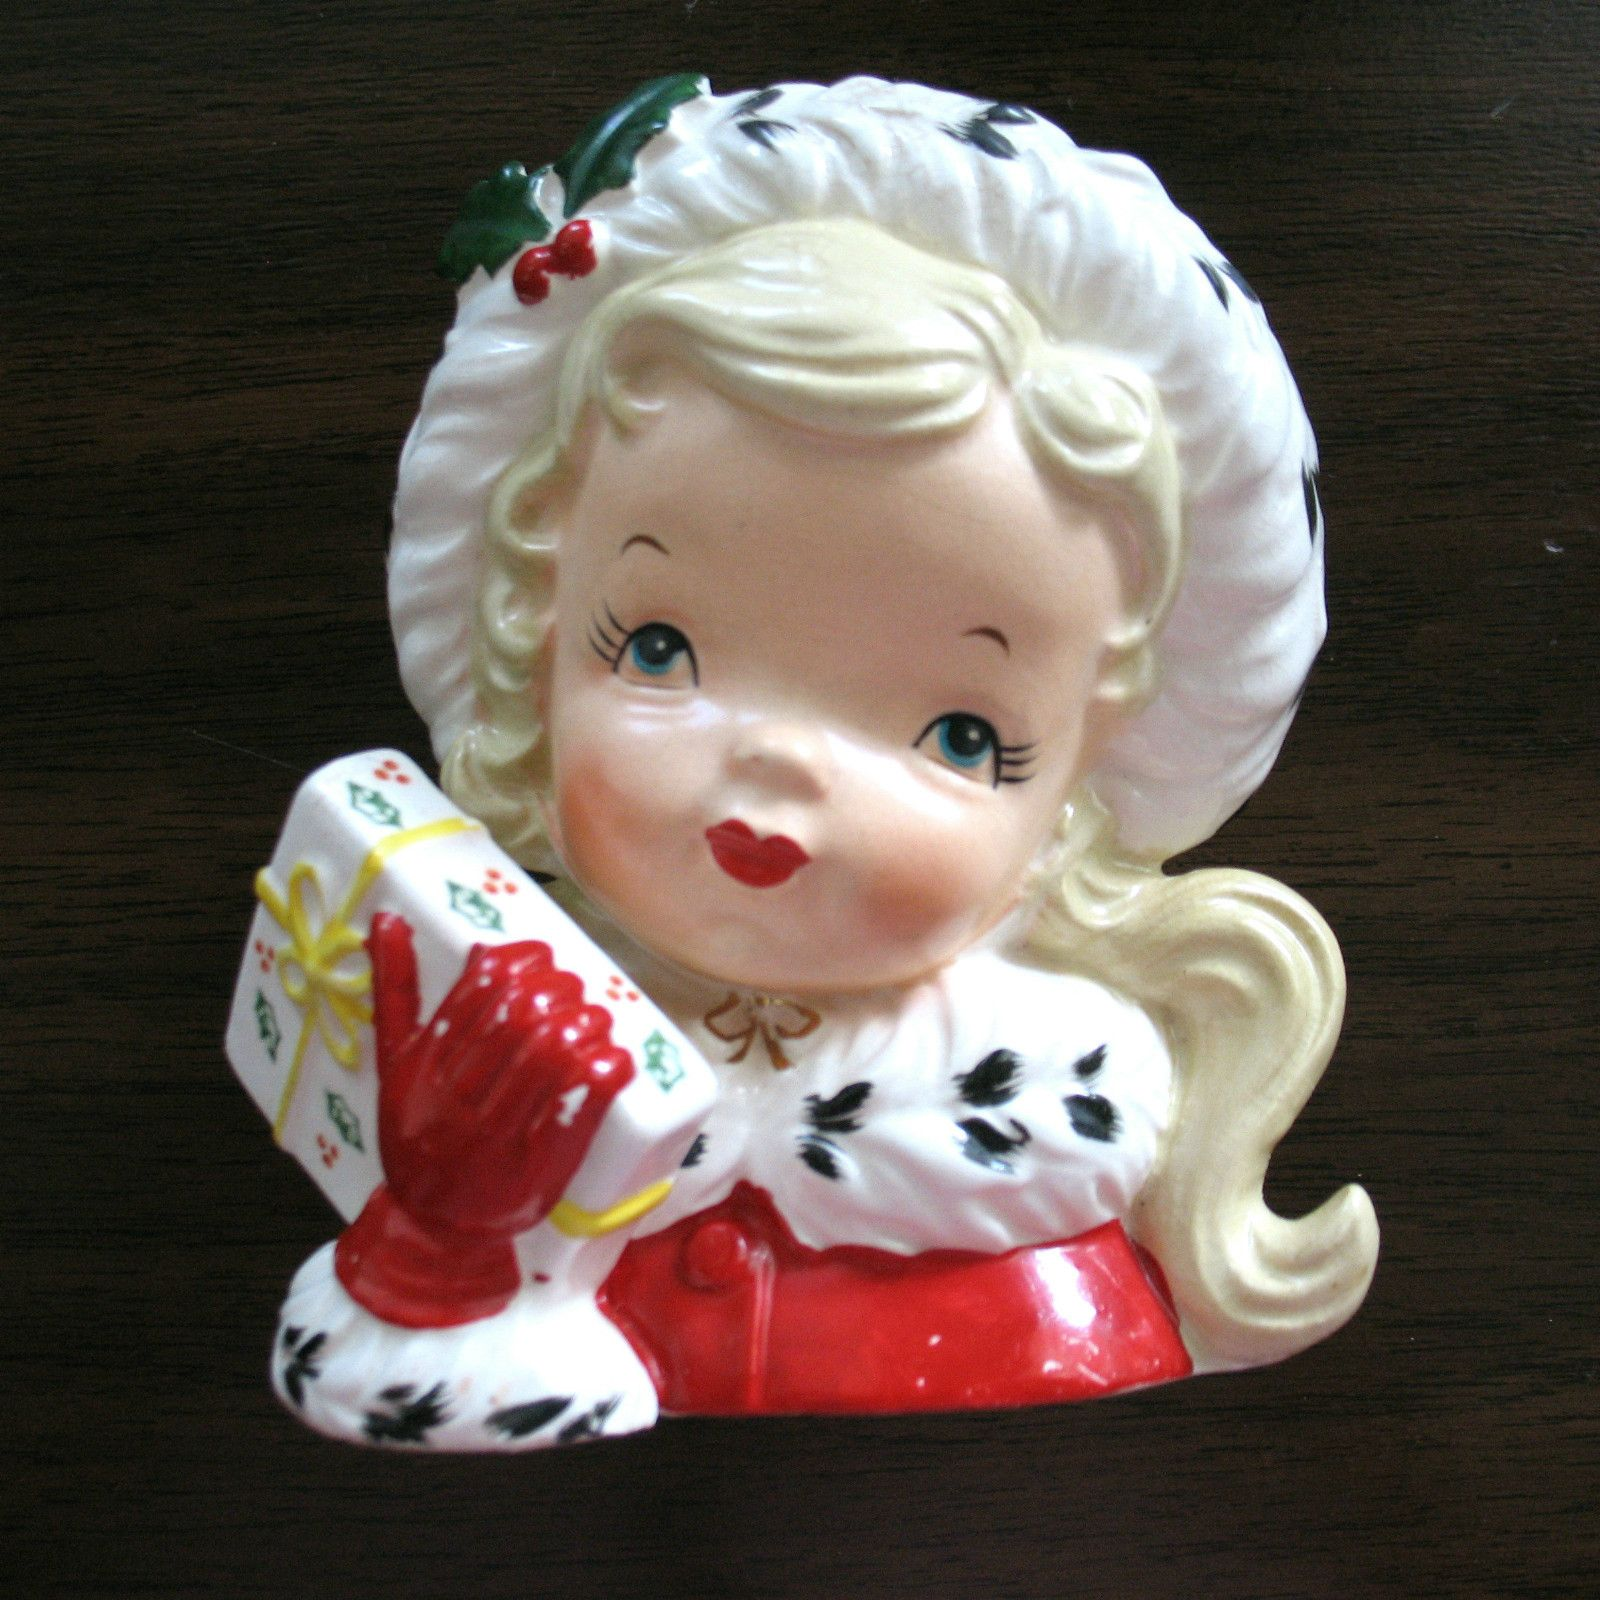 1956 napco christmas girl head vase headvase 3 pinterest 1956 napco christmas girl head vase i own this one too reviewsmspy